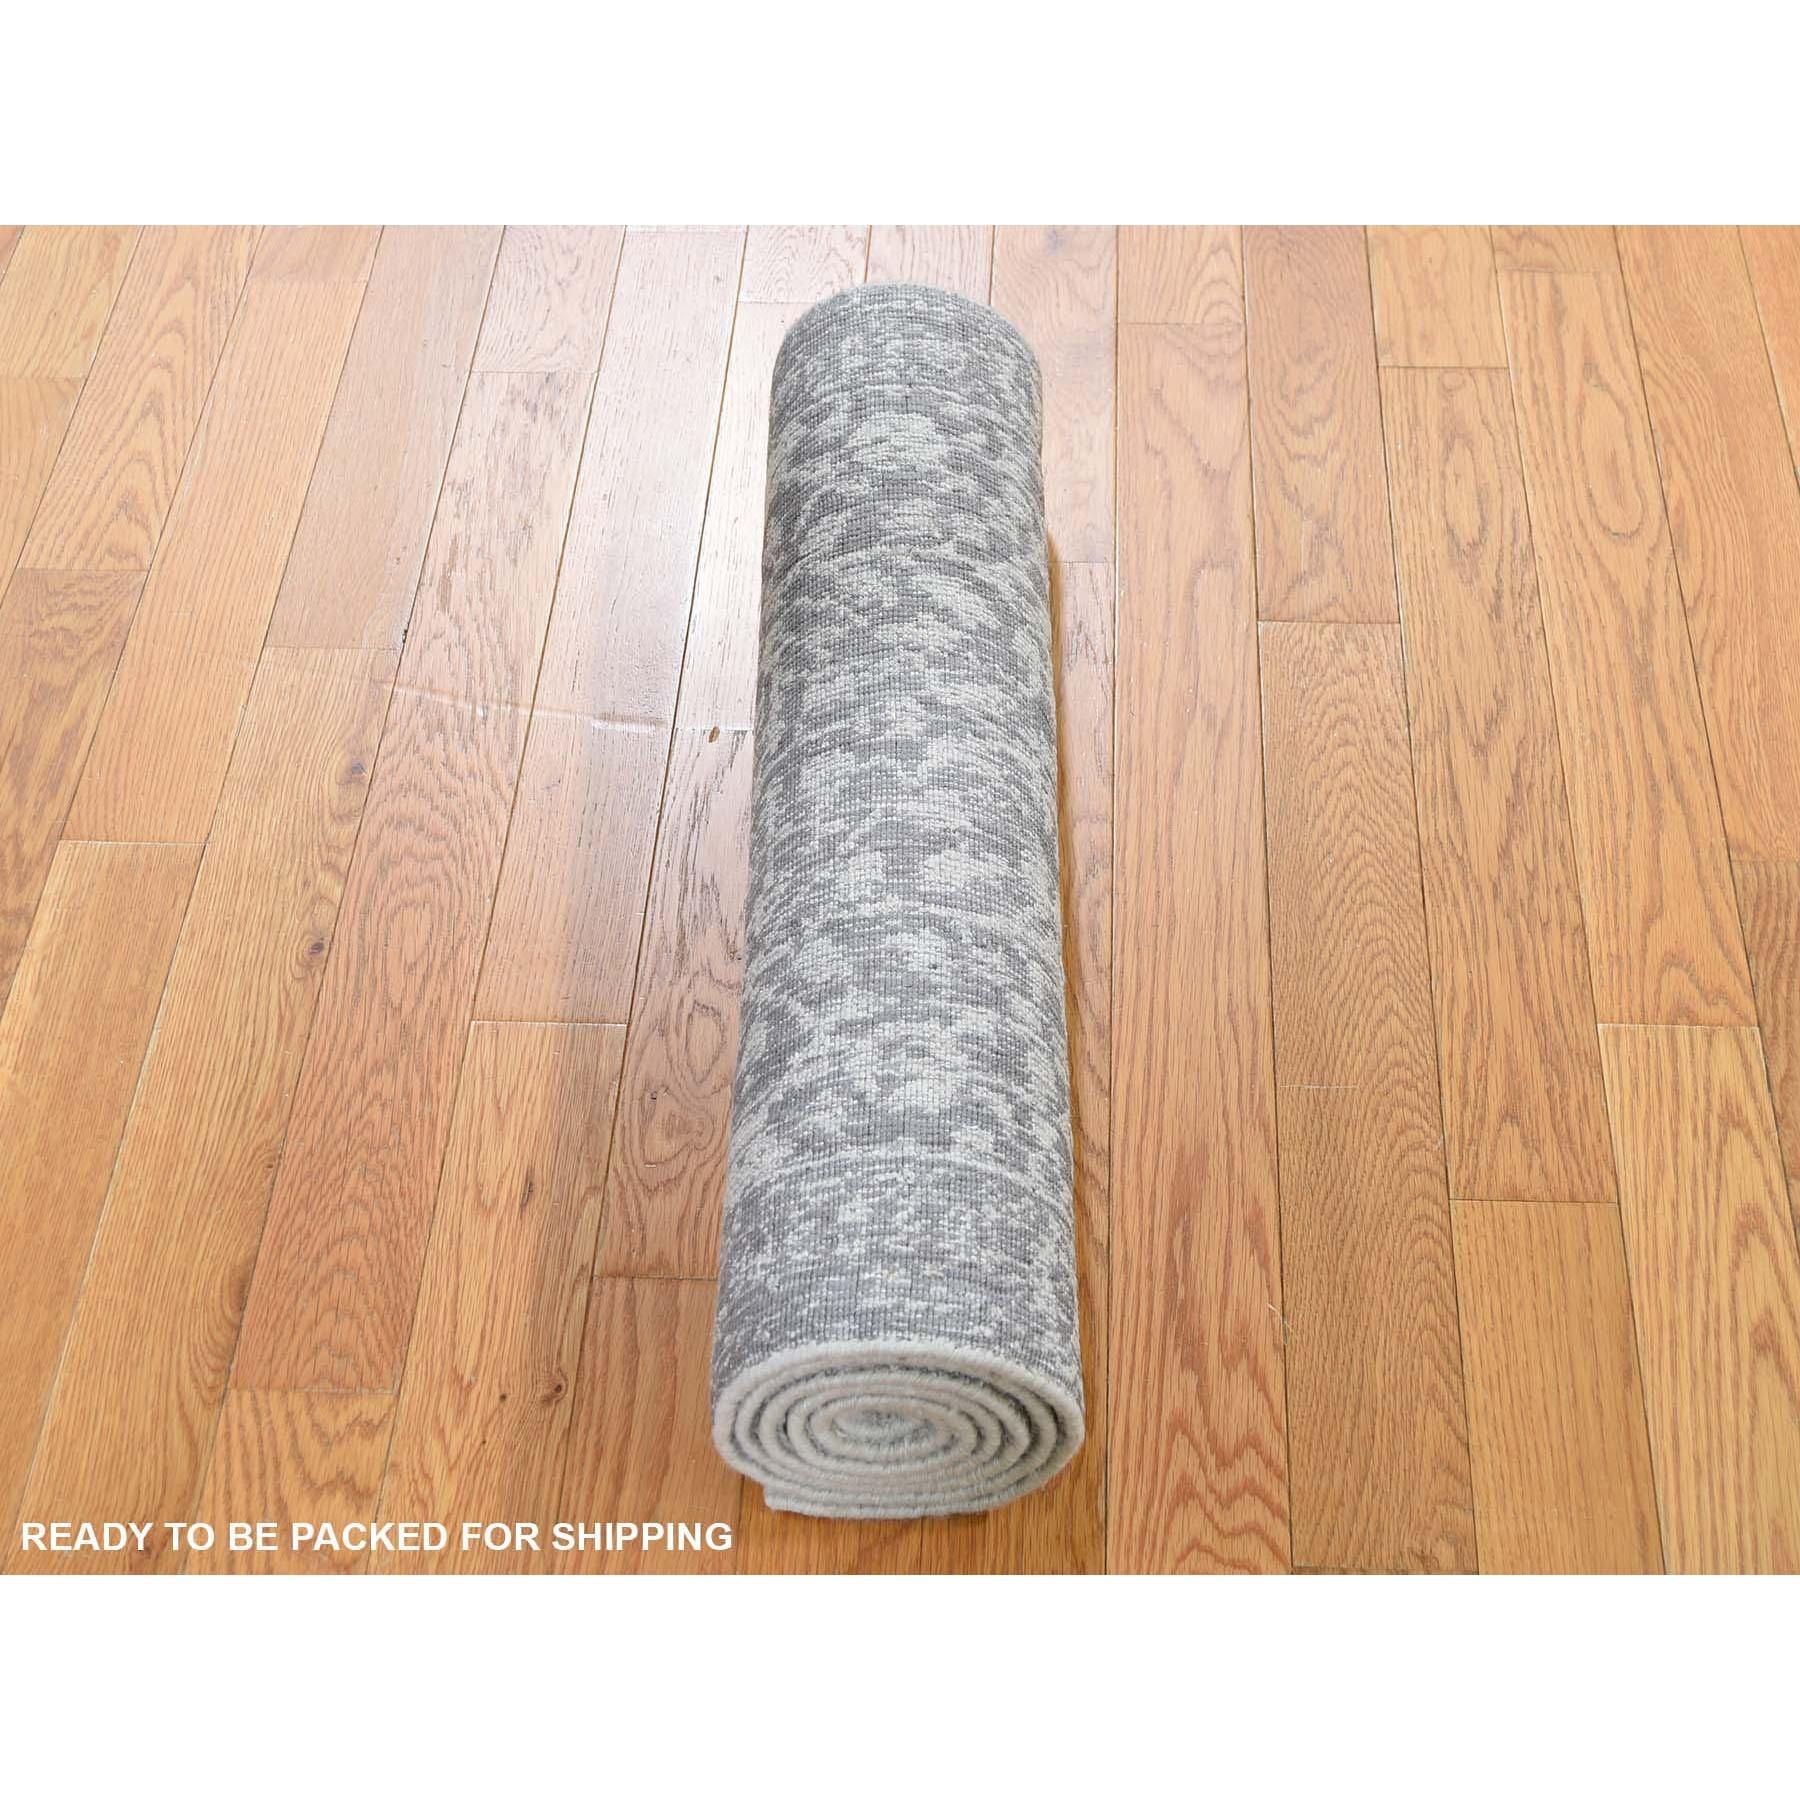 "2'5""x6' jacquard Hand-Loomed Gray Broken Cypress Tree Design Silken Thick And Plush Runner Oriental Rug"